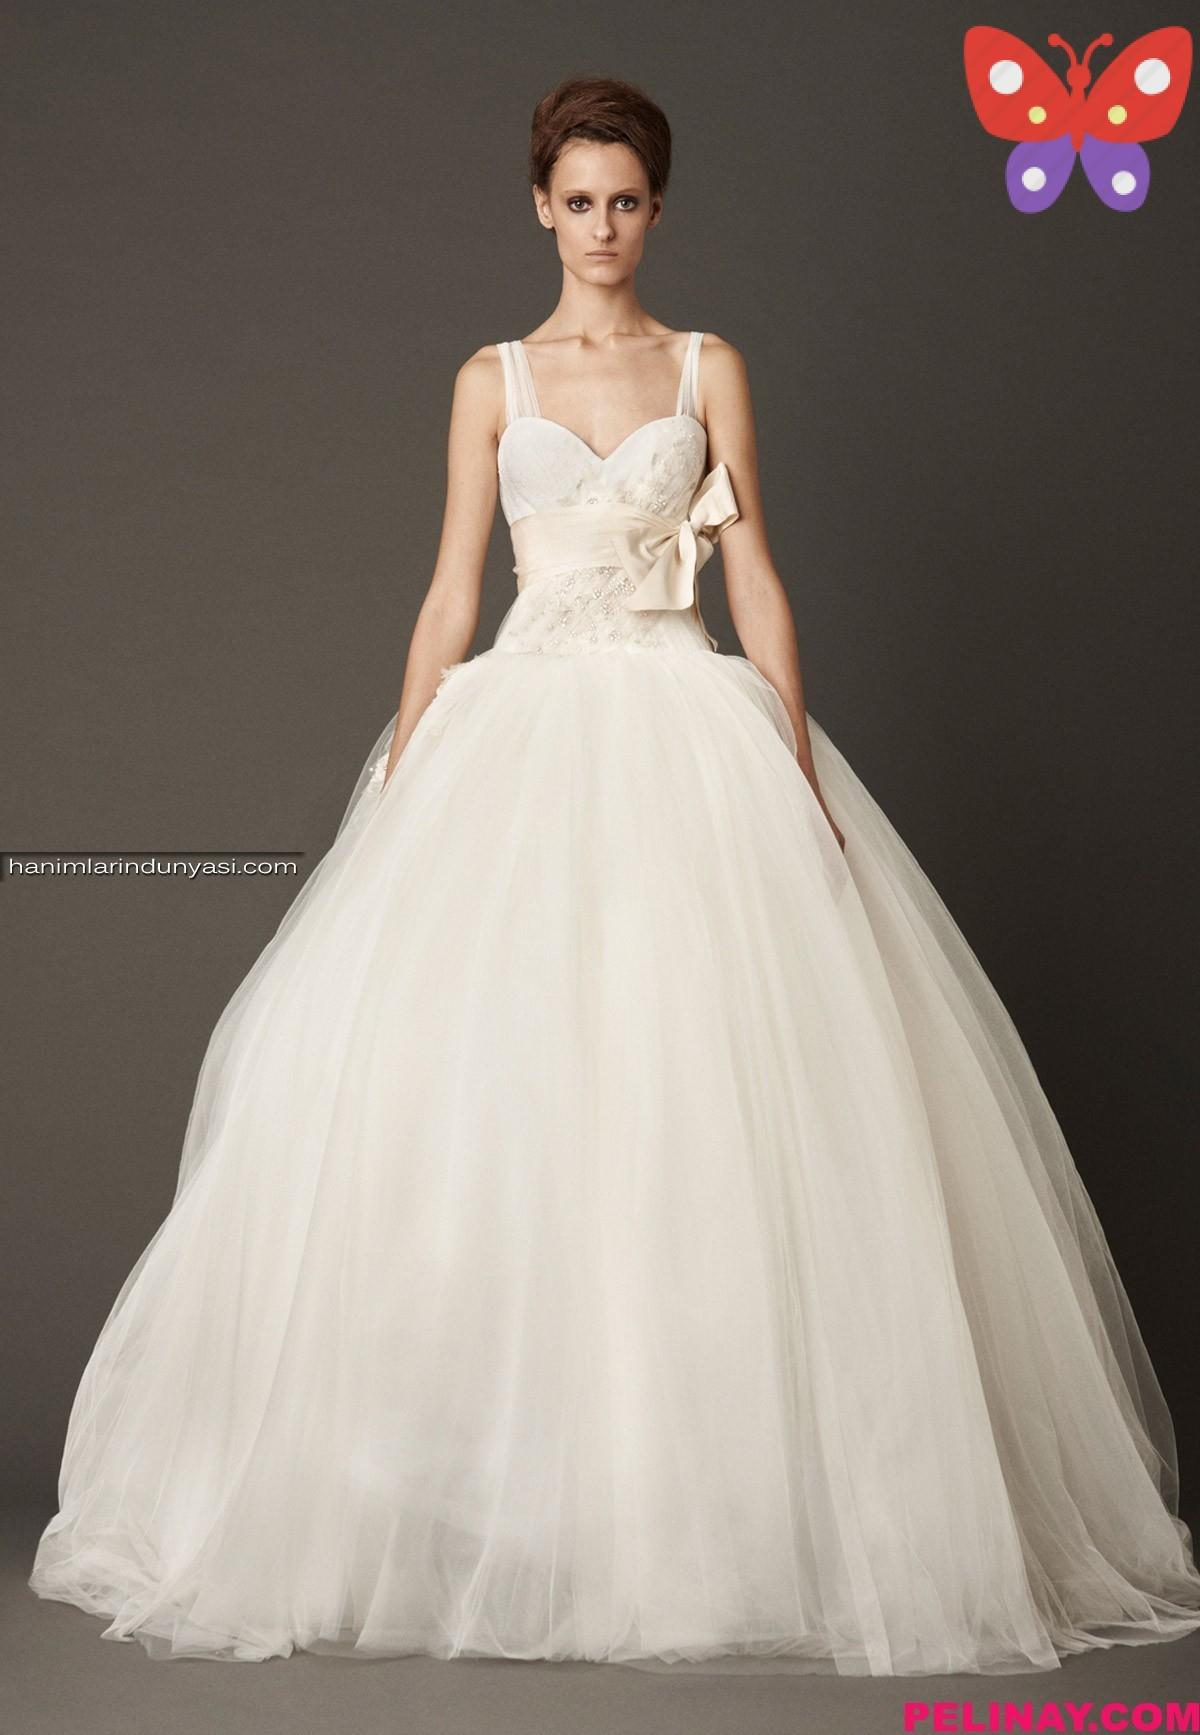 5-Vera-Wang-2014-Sonbahar-Kış-Gelinlik-Modelleri-Wedding-Dresses-4